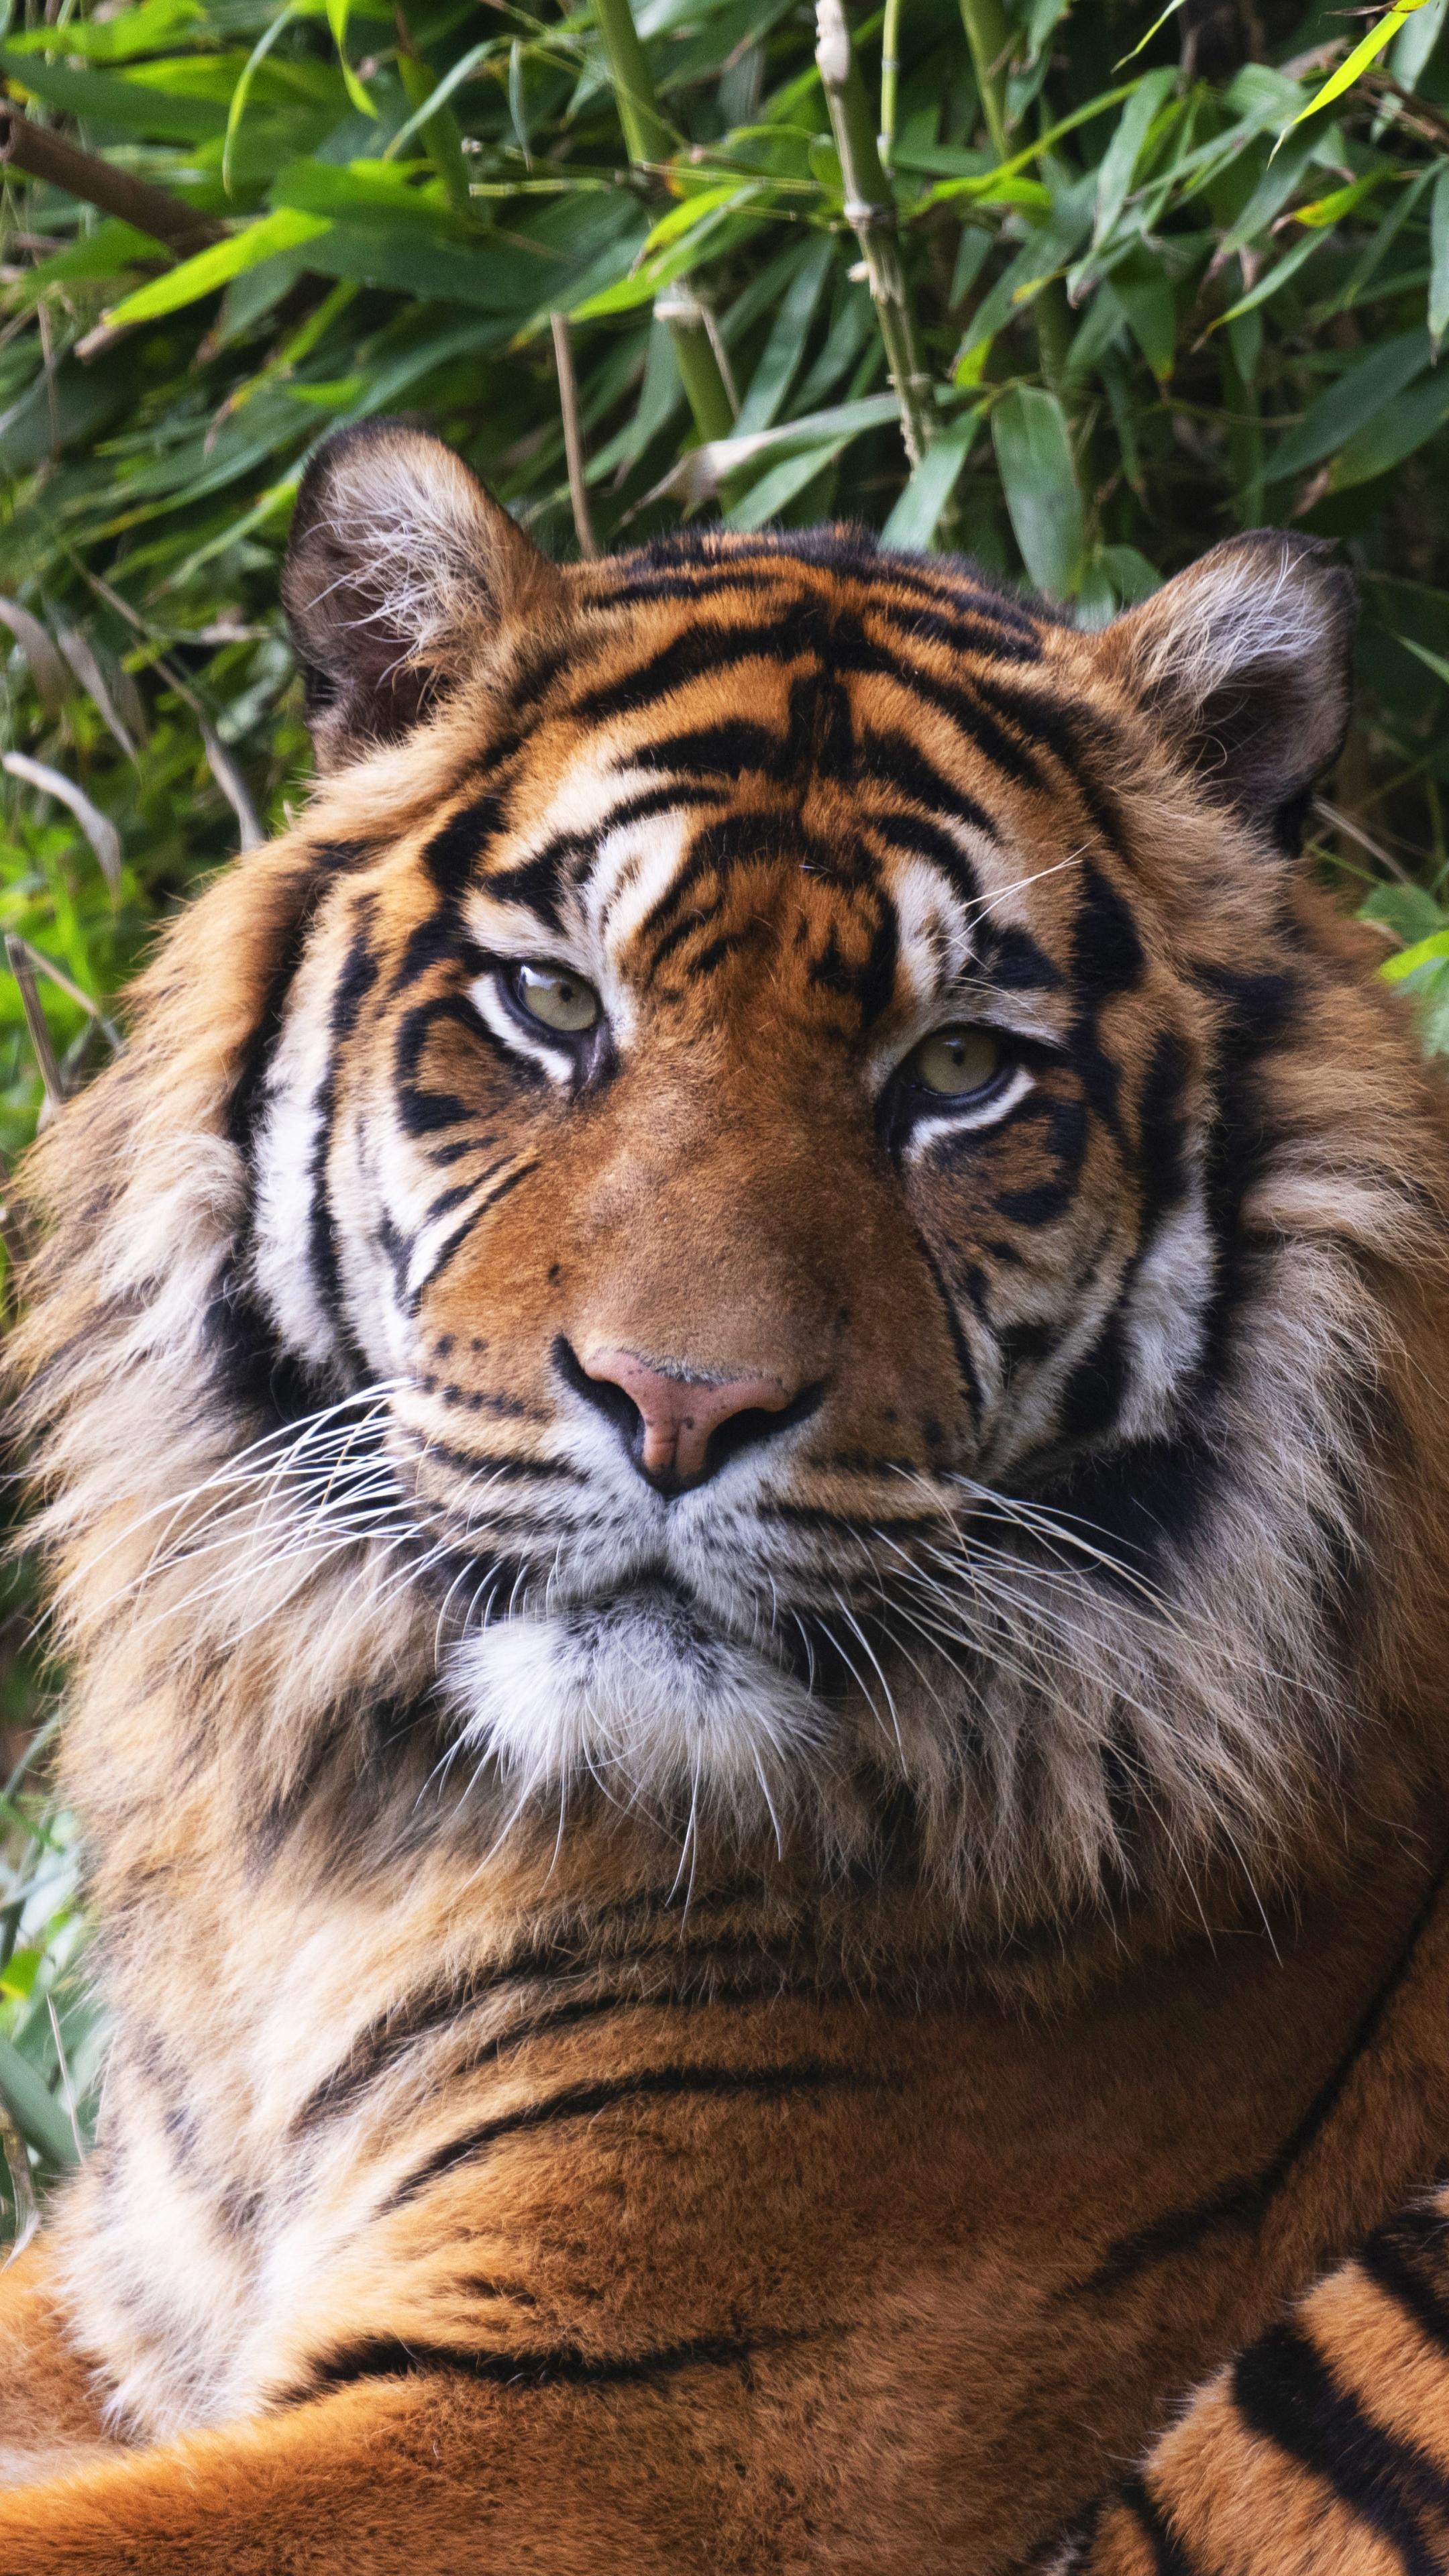 Tiger Splash Oil Paint Wallpaper Painting Wallpaper Art